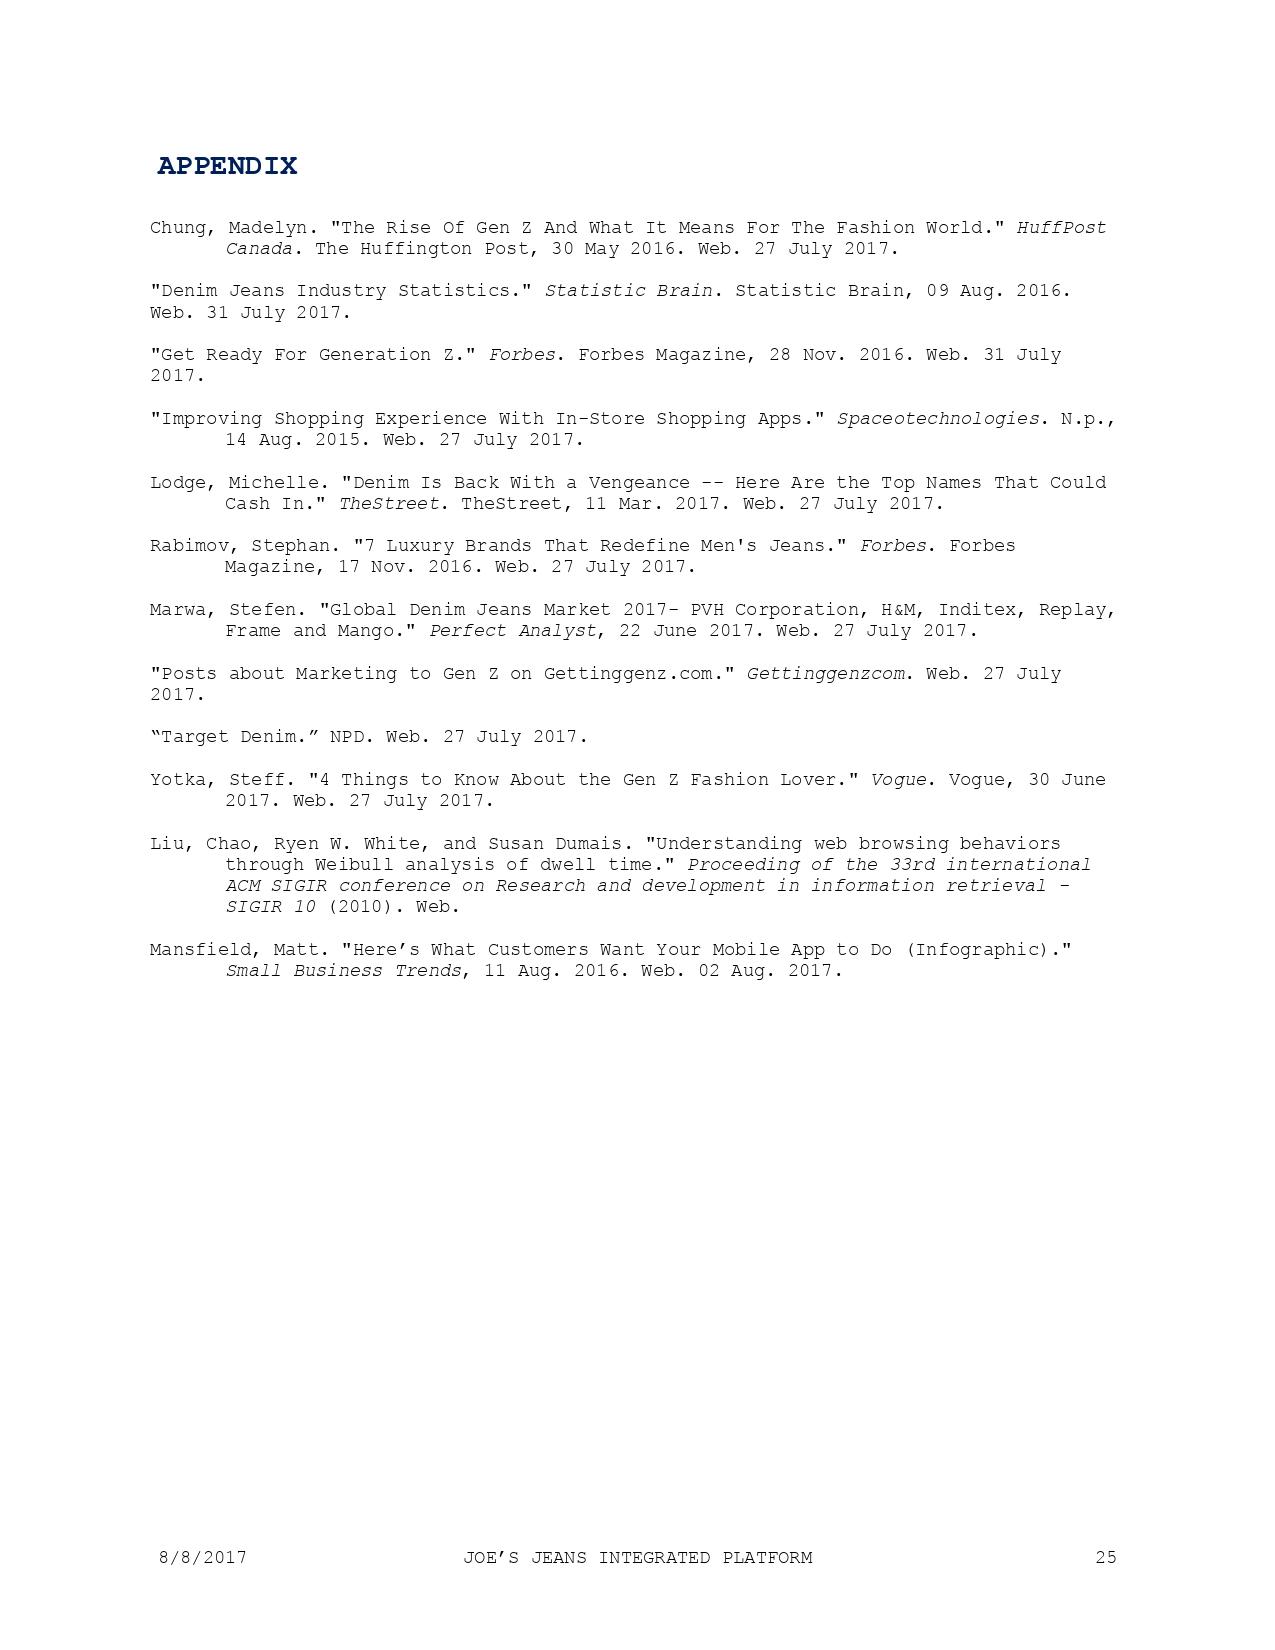 JOES BUSINESS PLAN_page-0026.jpg